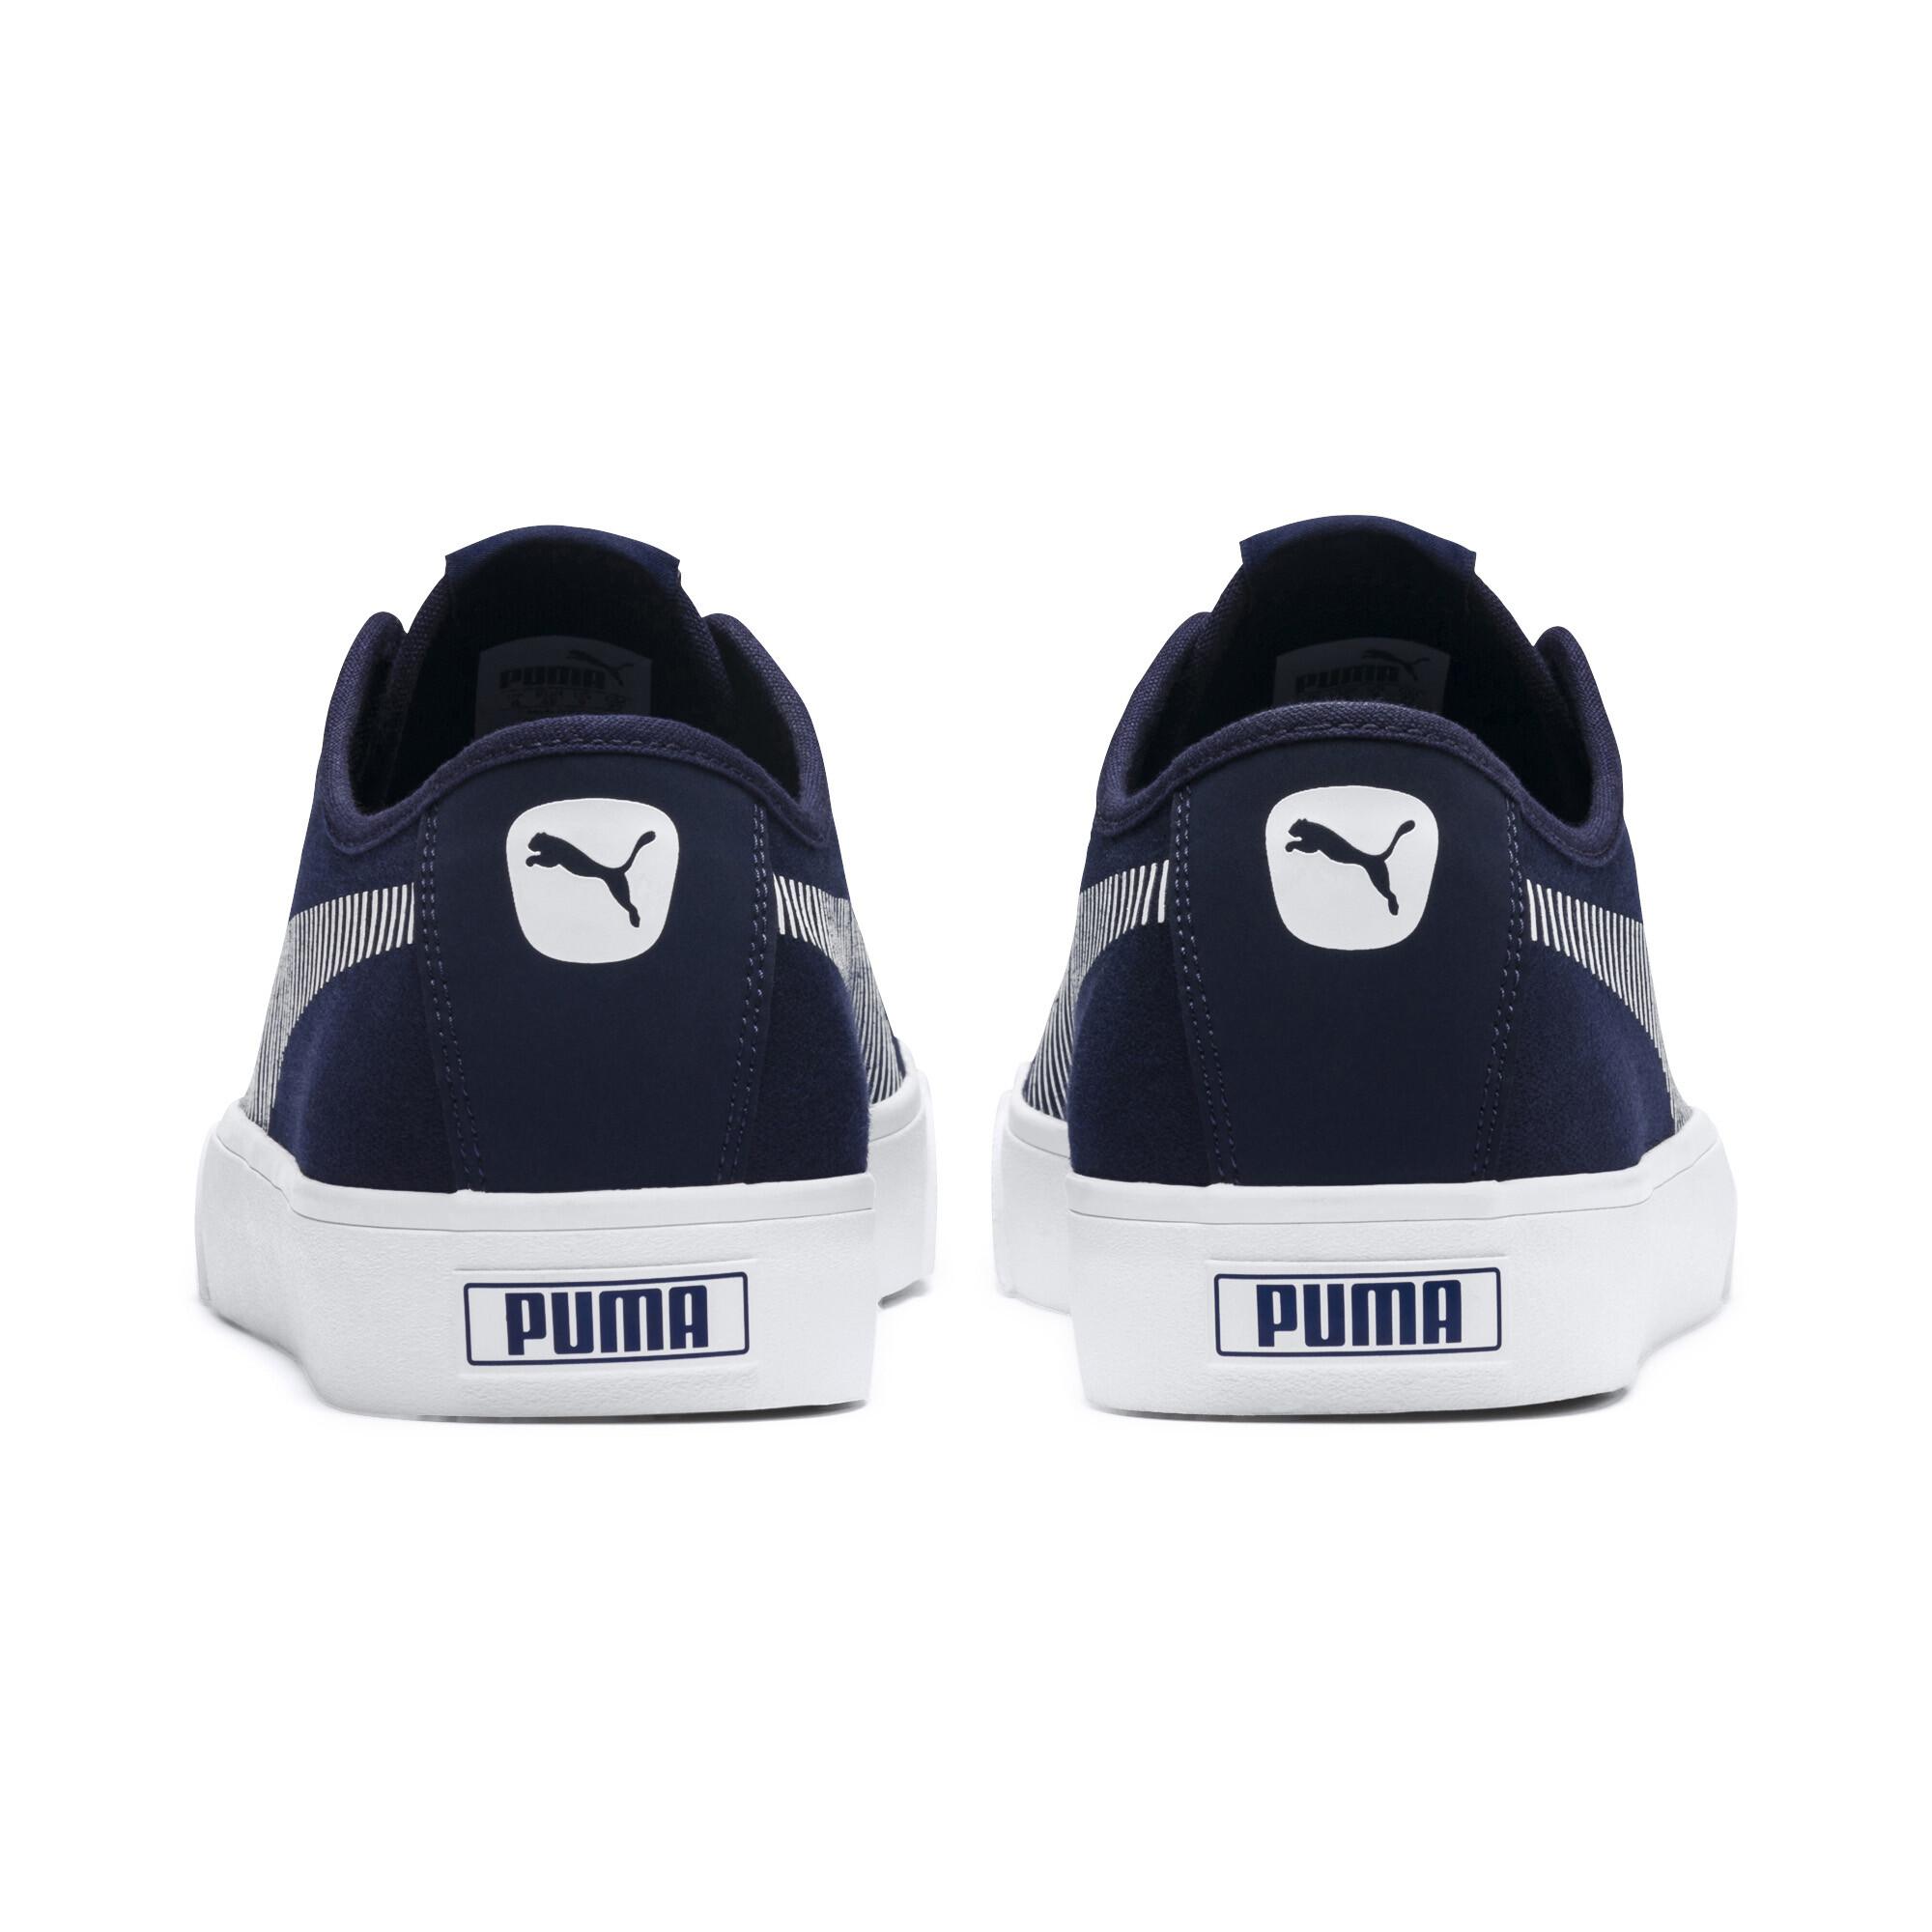 PUMA-Bari-Sneakers-Men-Shoe-Basics thumbnail 14